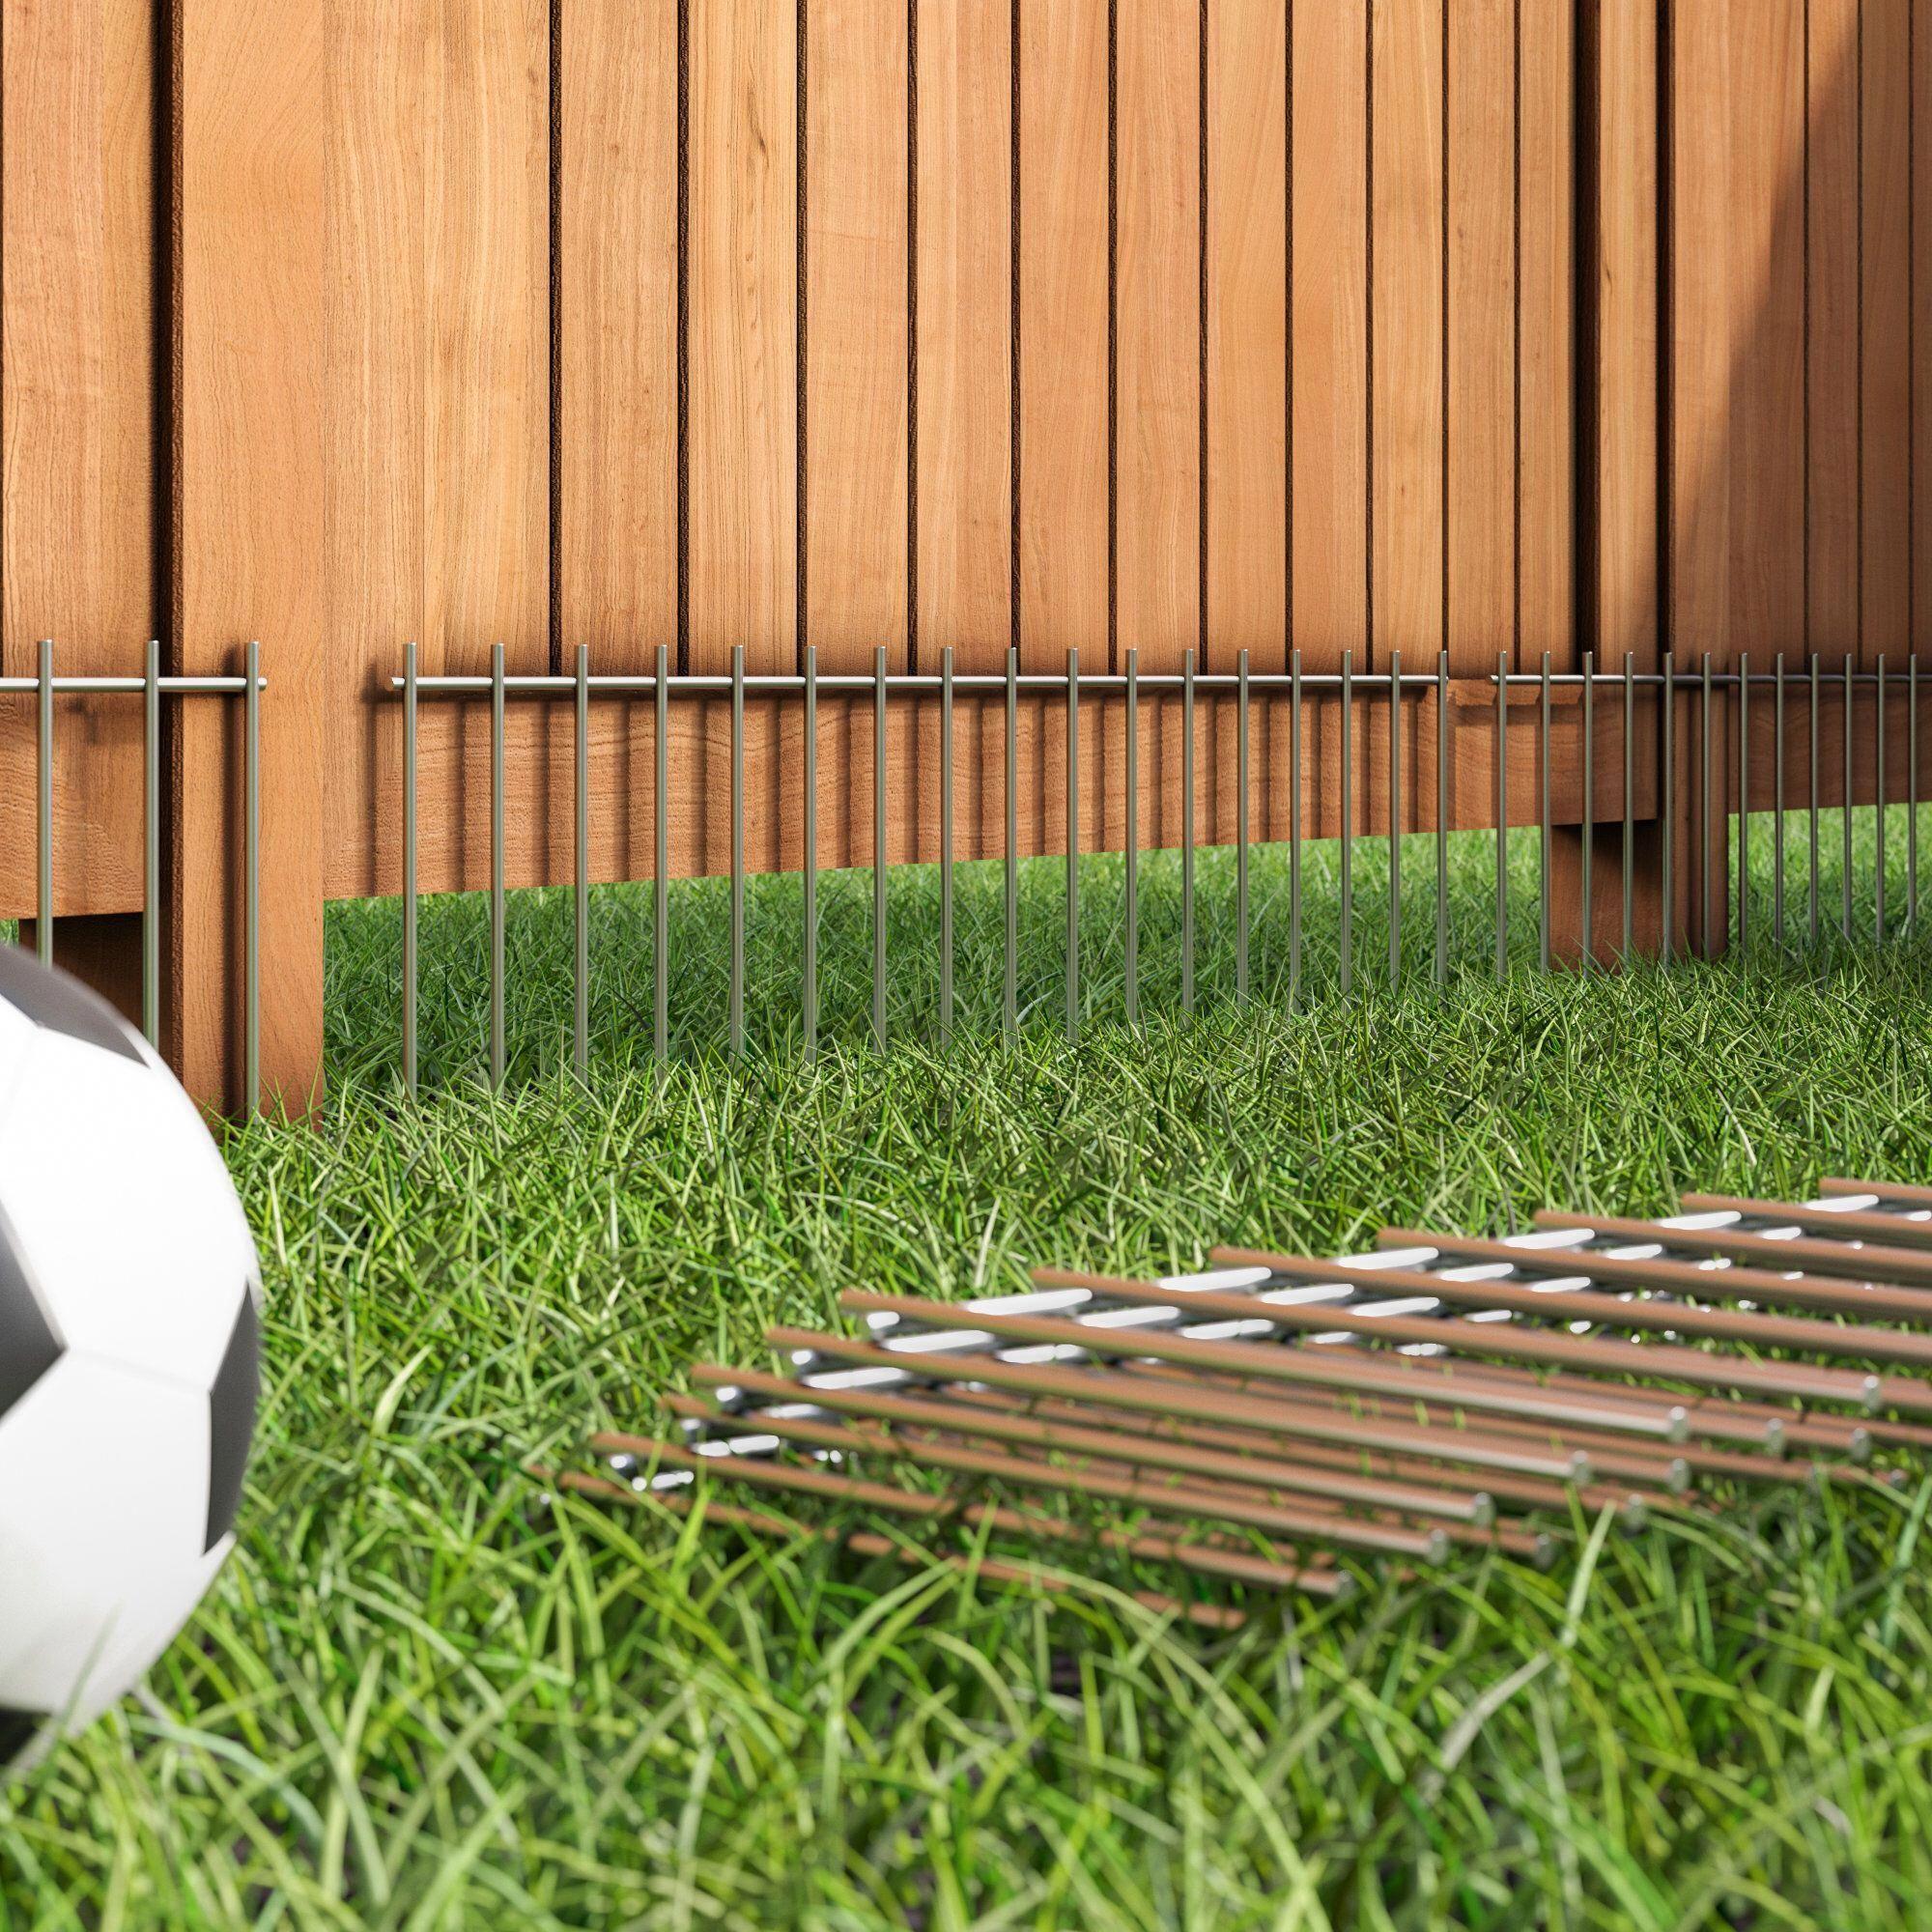 19 Remarkable Dog Fence Panels Outdoor Dog Fence Electric ...